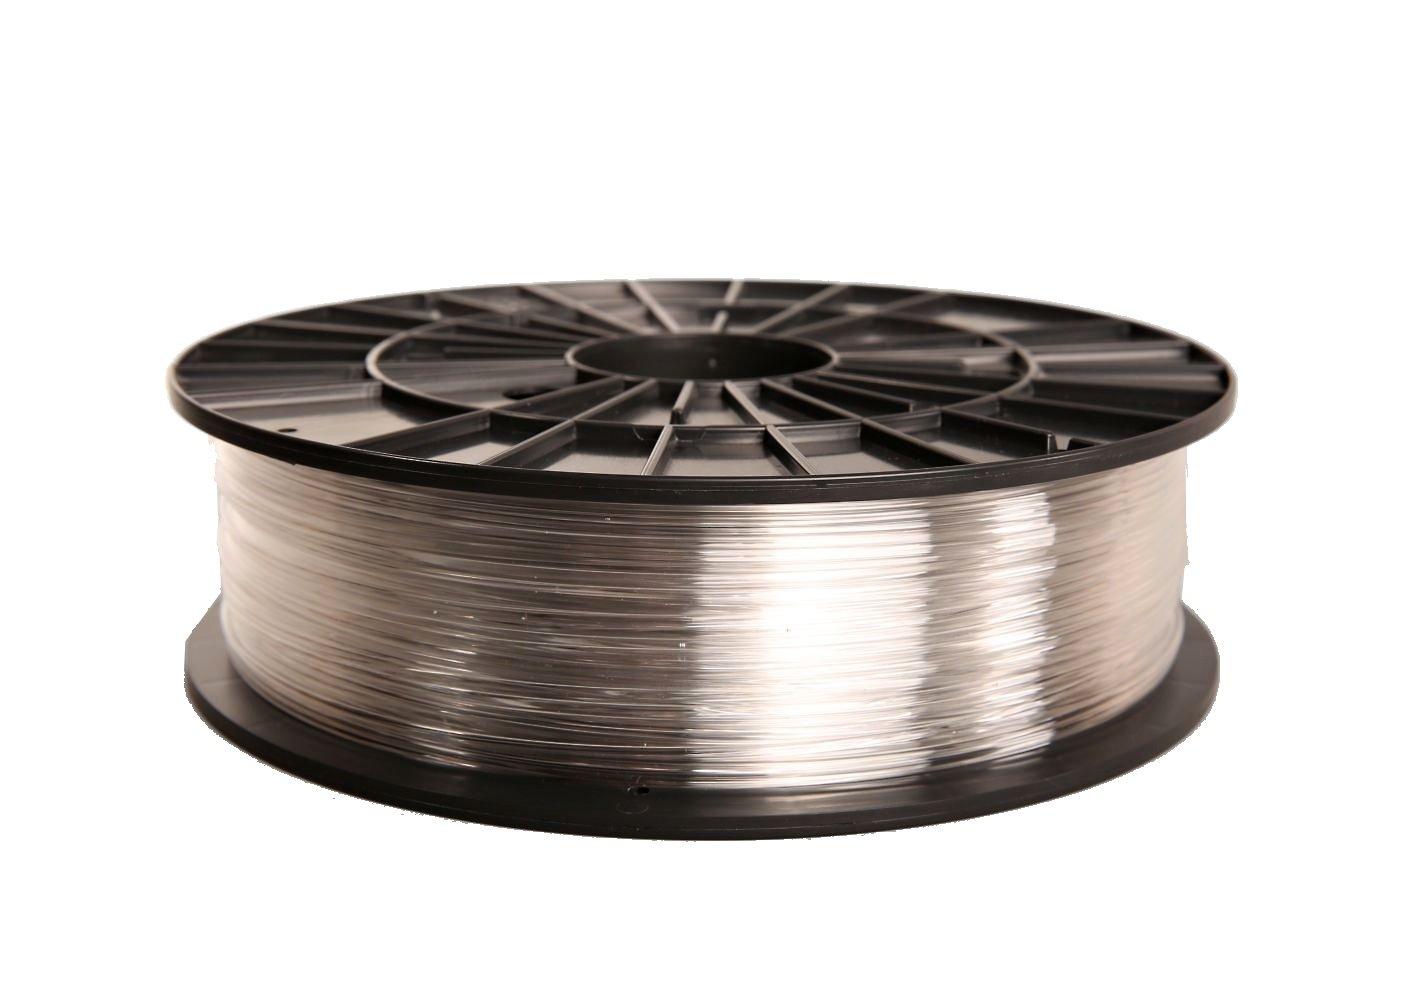 Filamento de PMMA Transparente 1,75mm 0,5kg de Filament-PM: Amazon ...